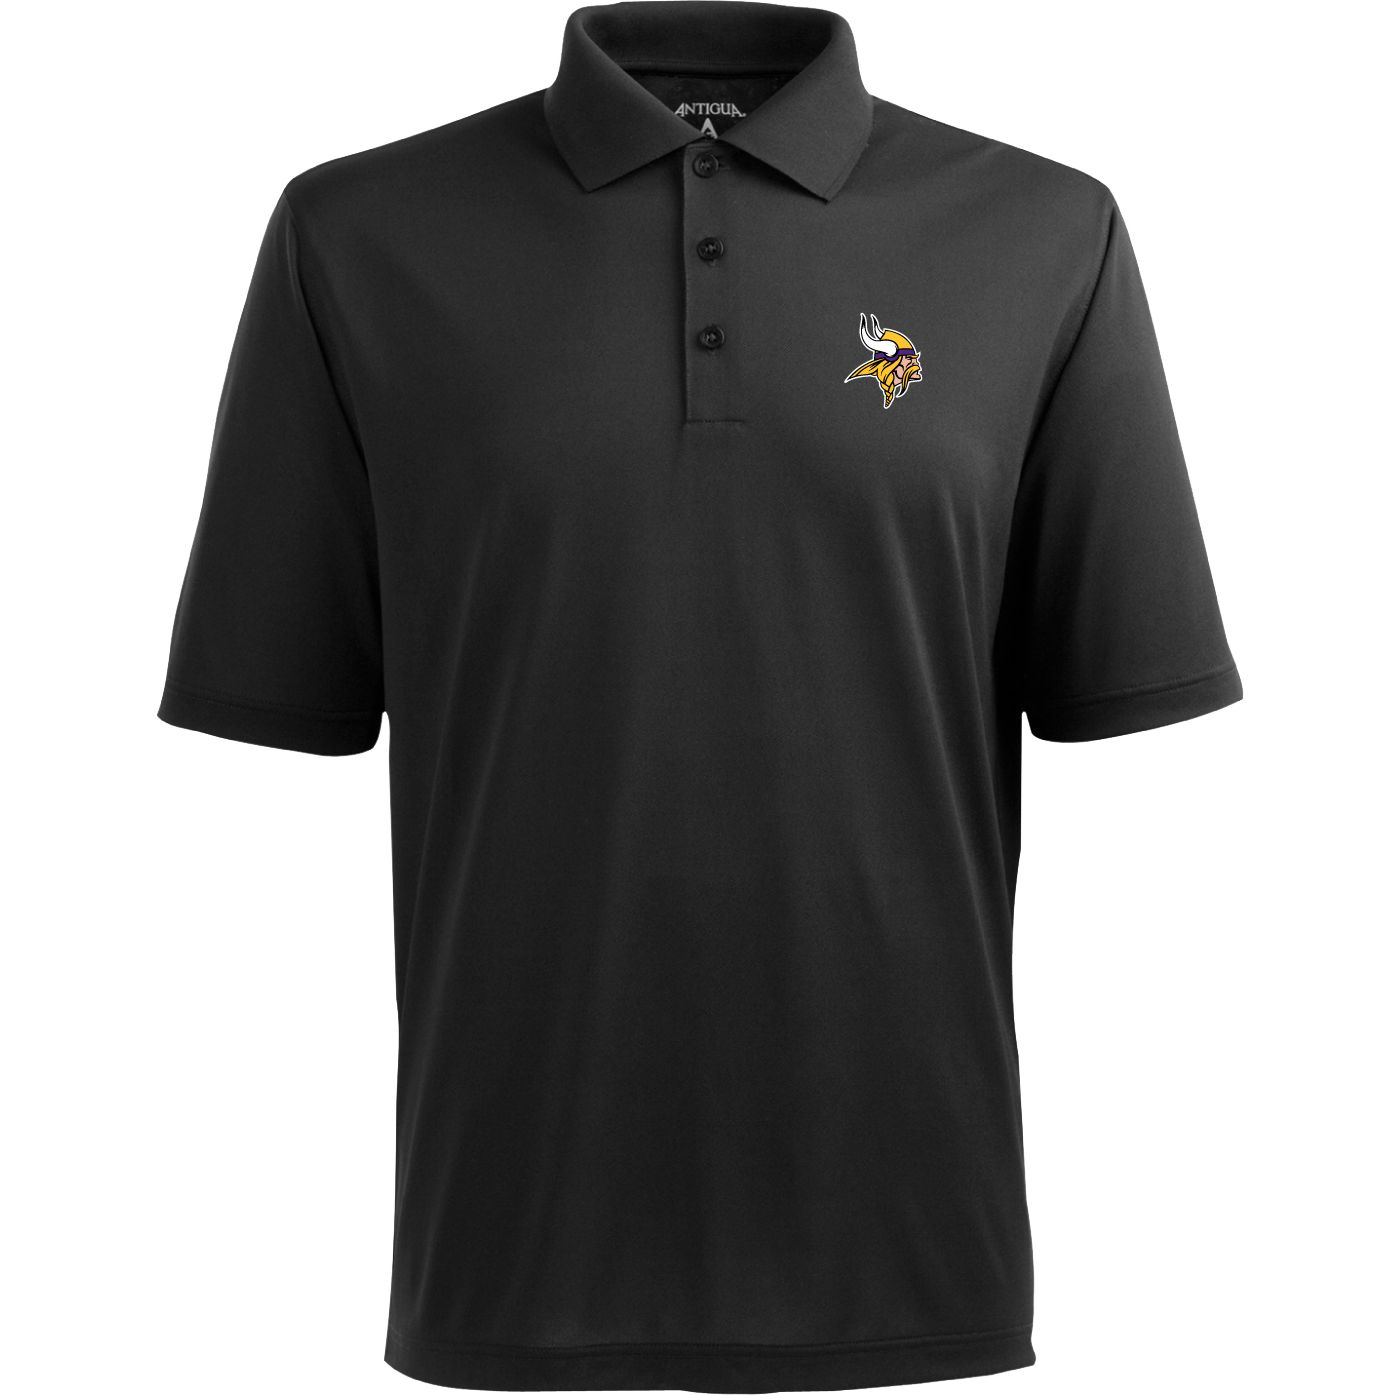 Antigua Men's Minnesota Vikings Pique Xtra-Lite Black Polo